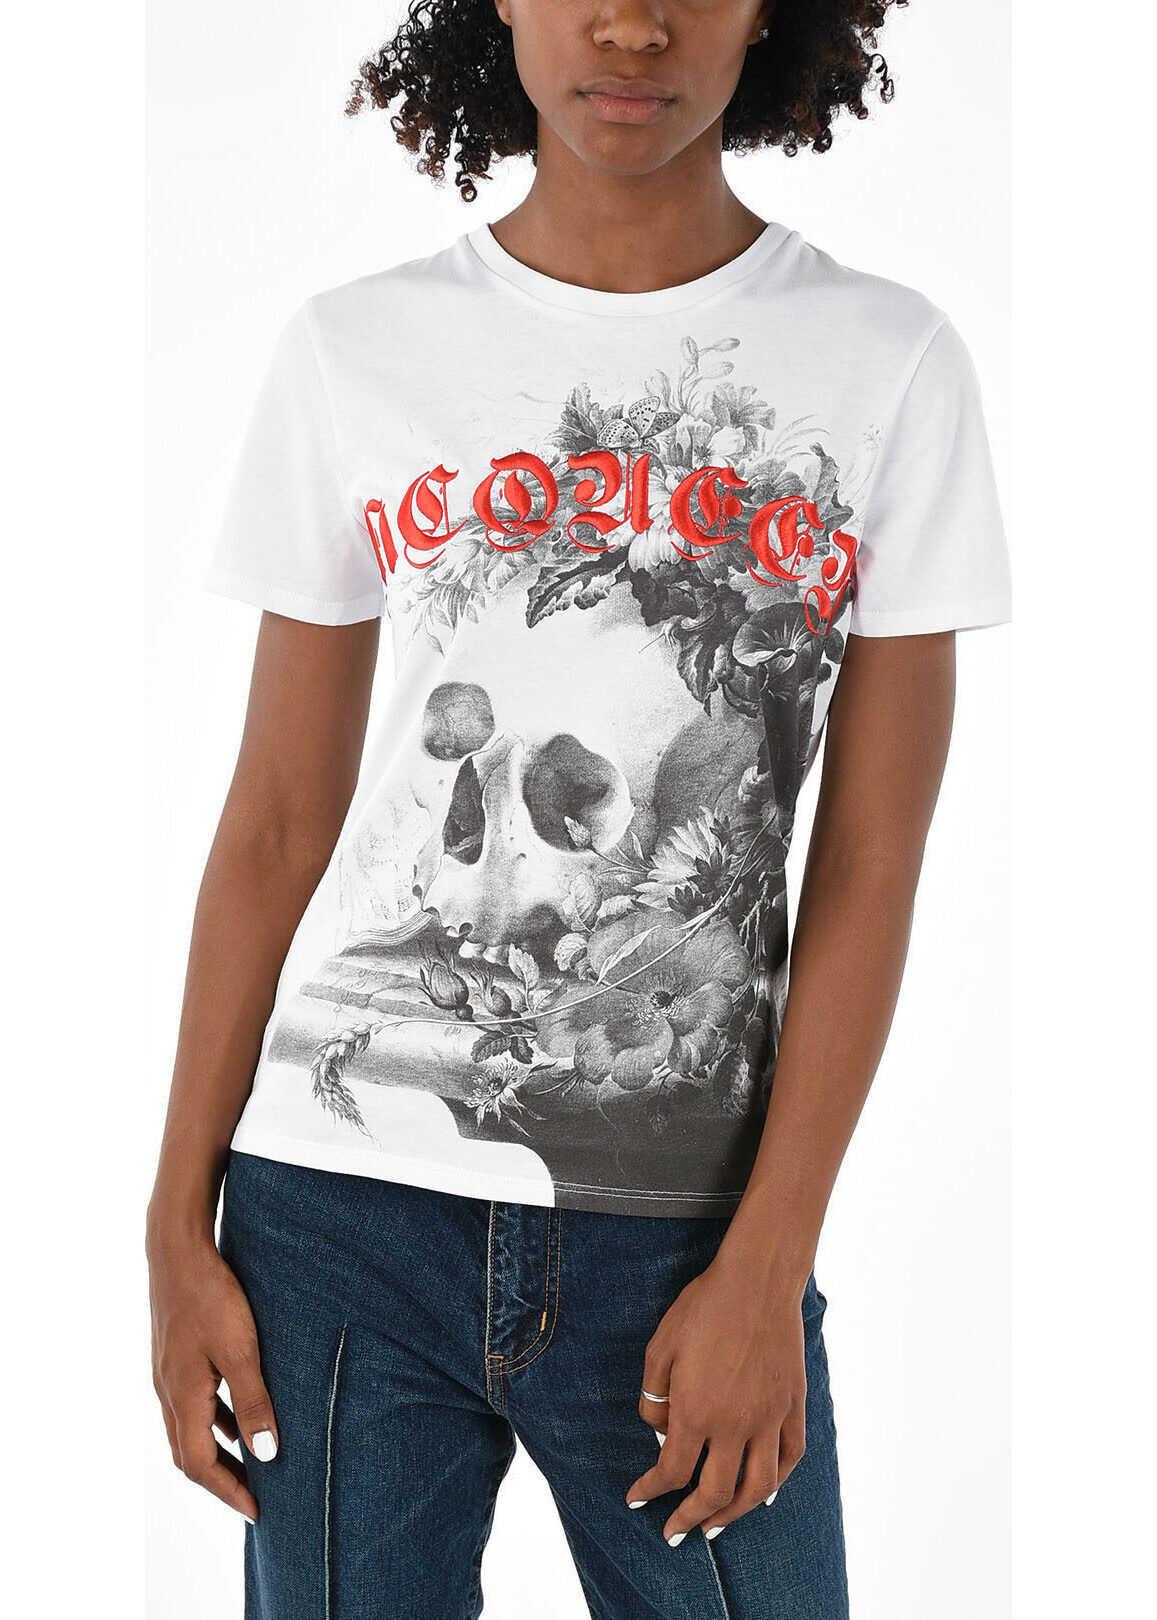 Alexander McQueen Embroidered T-shirt WHITE